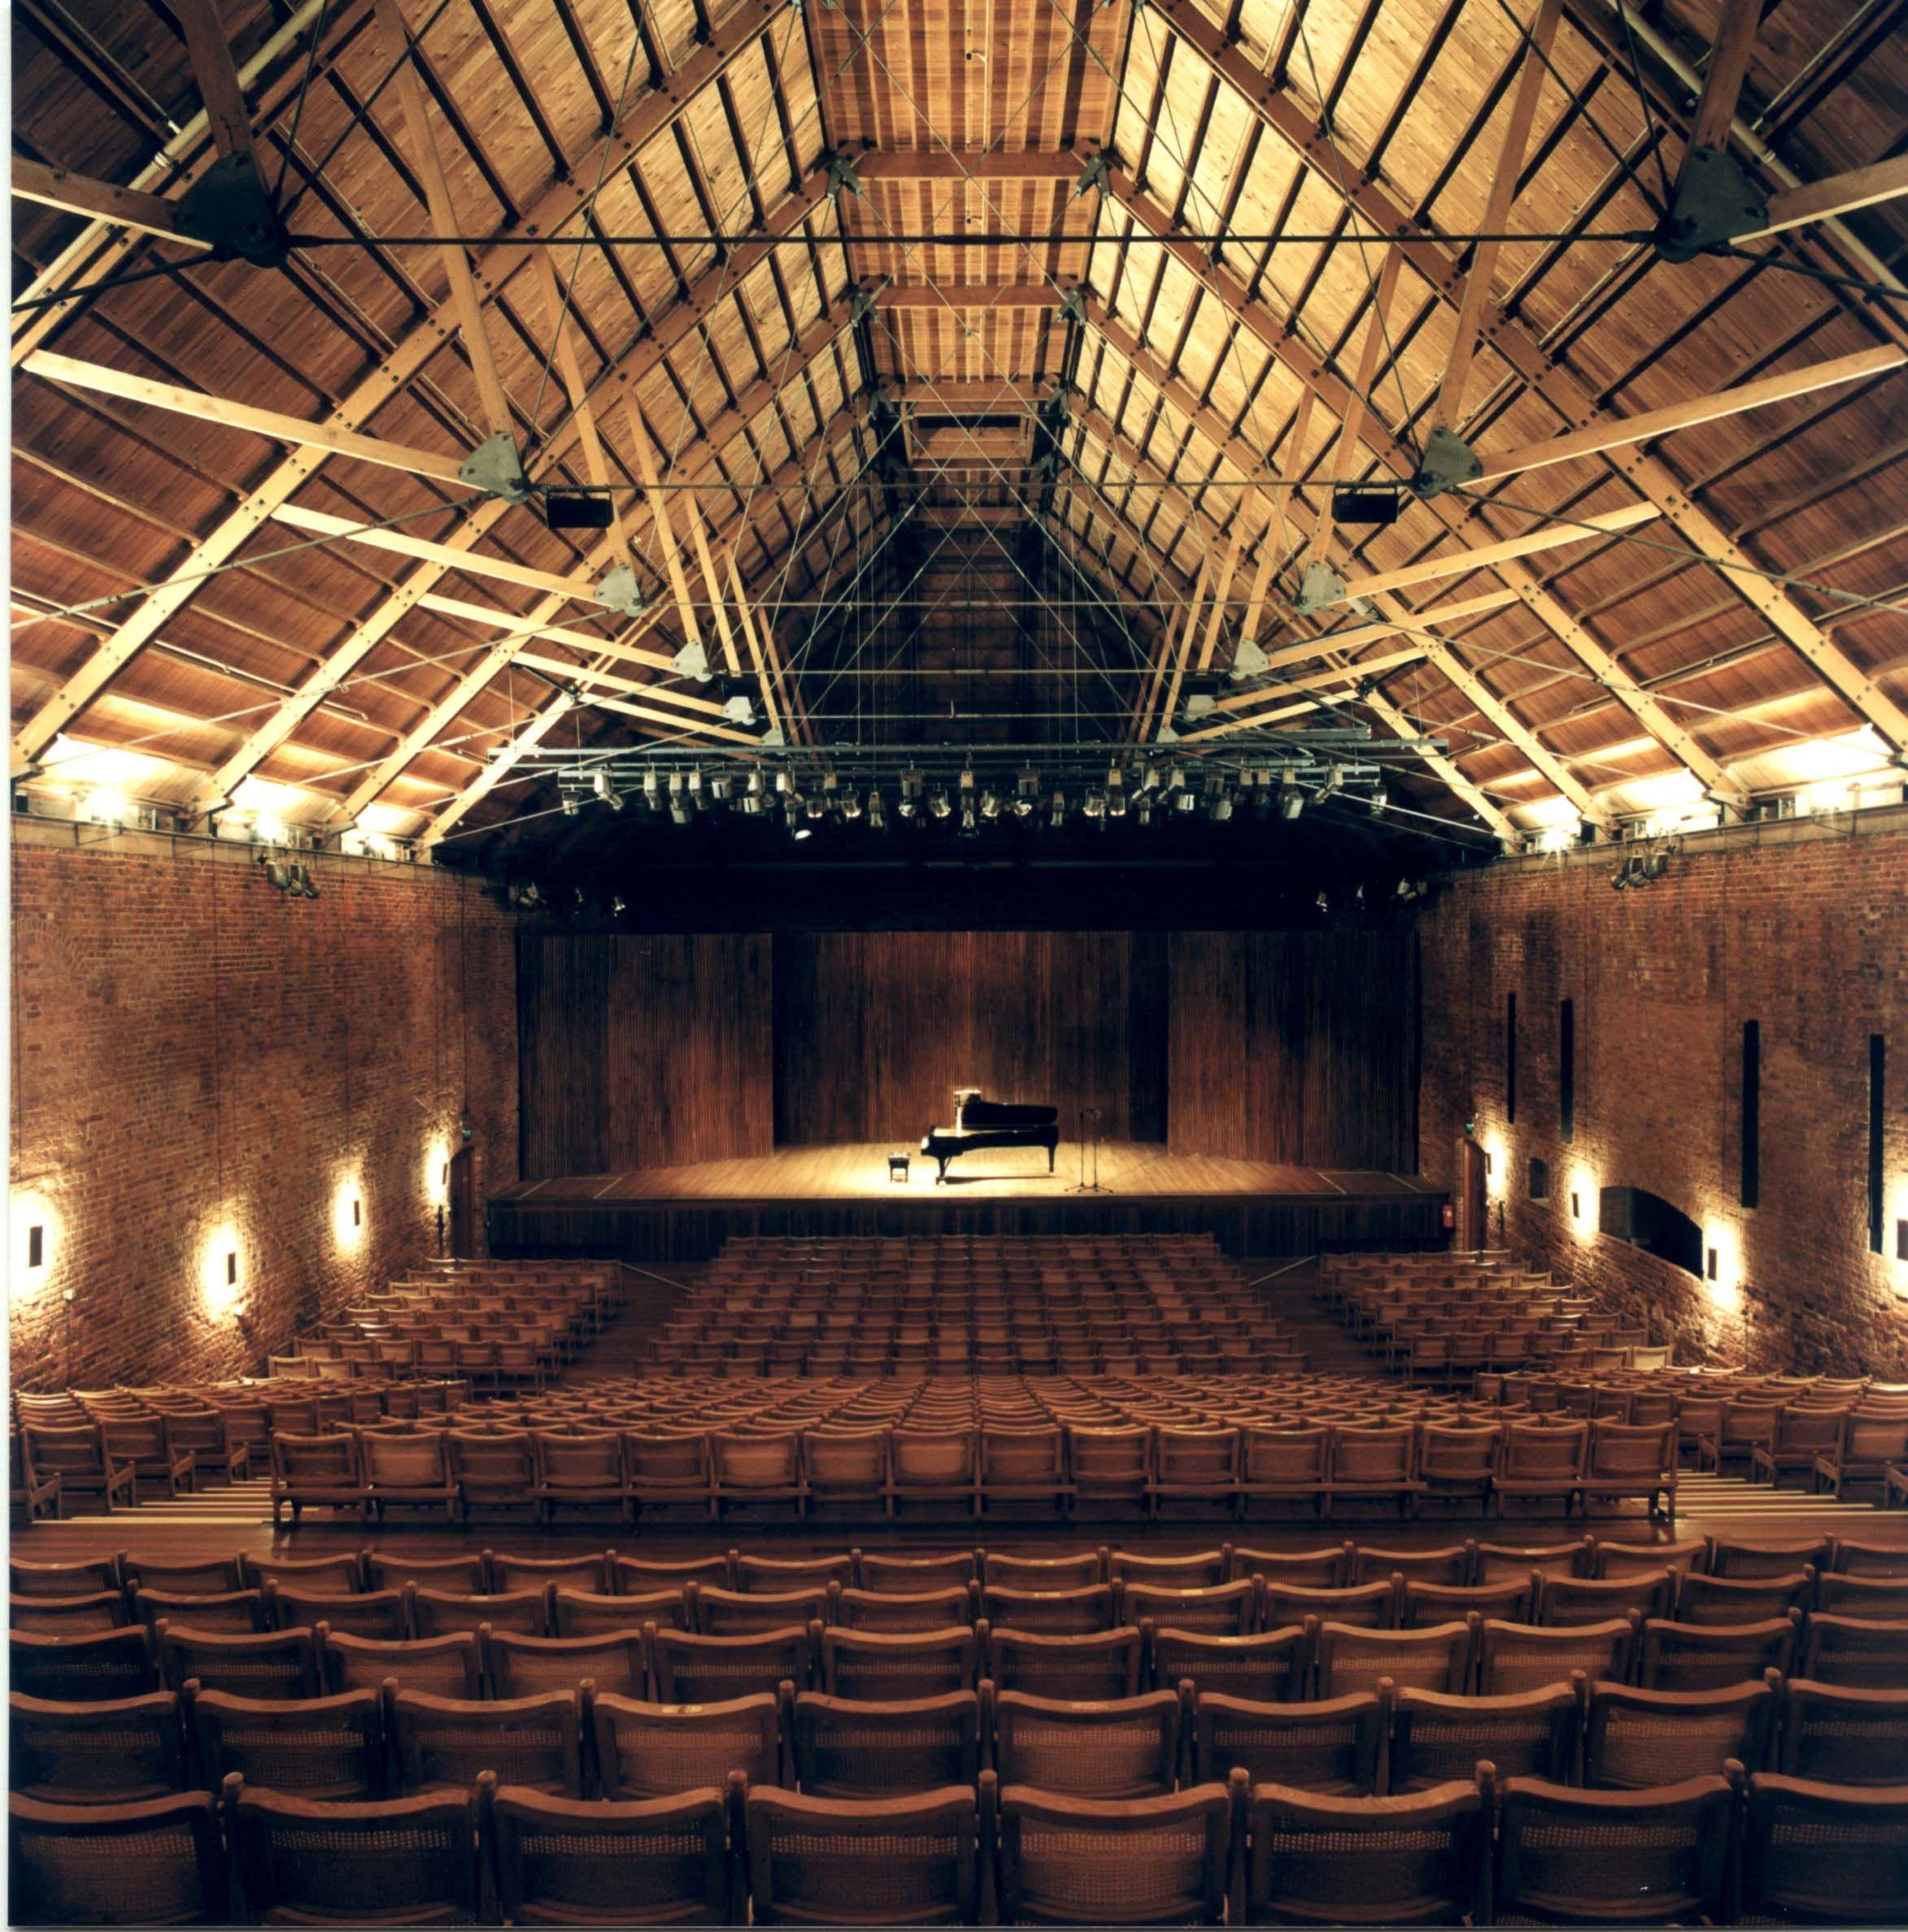 Felipe Lara Composer Concert Hall Theatre Architecture Snape Maltings Concert Hall